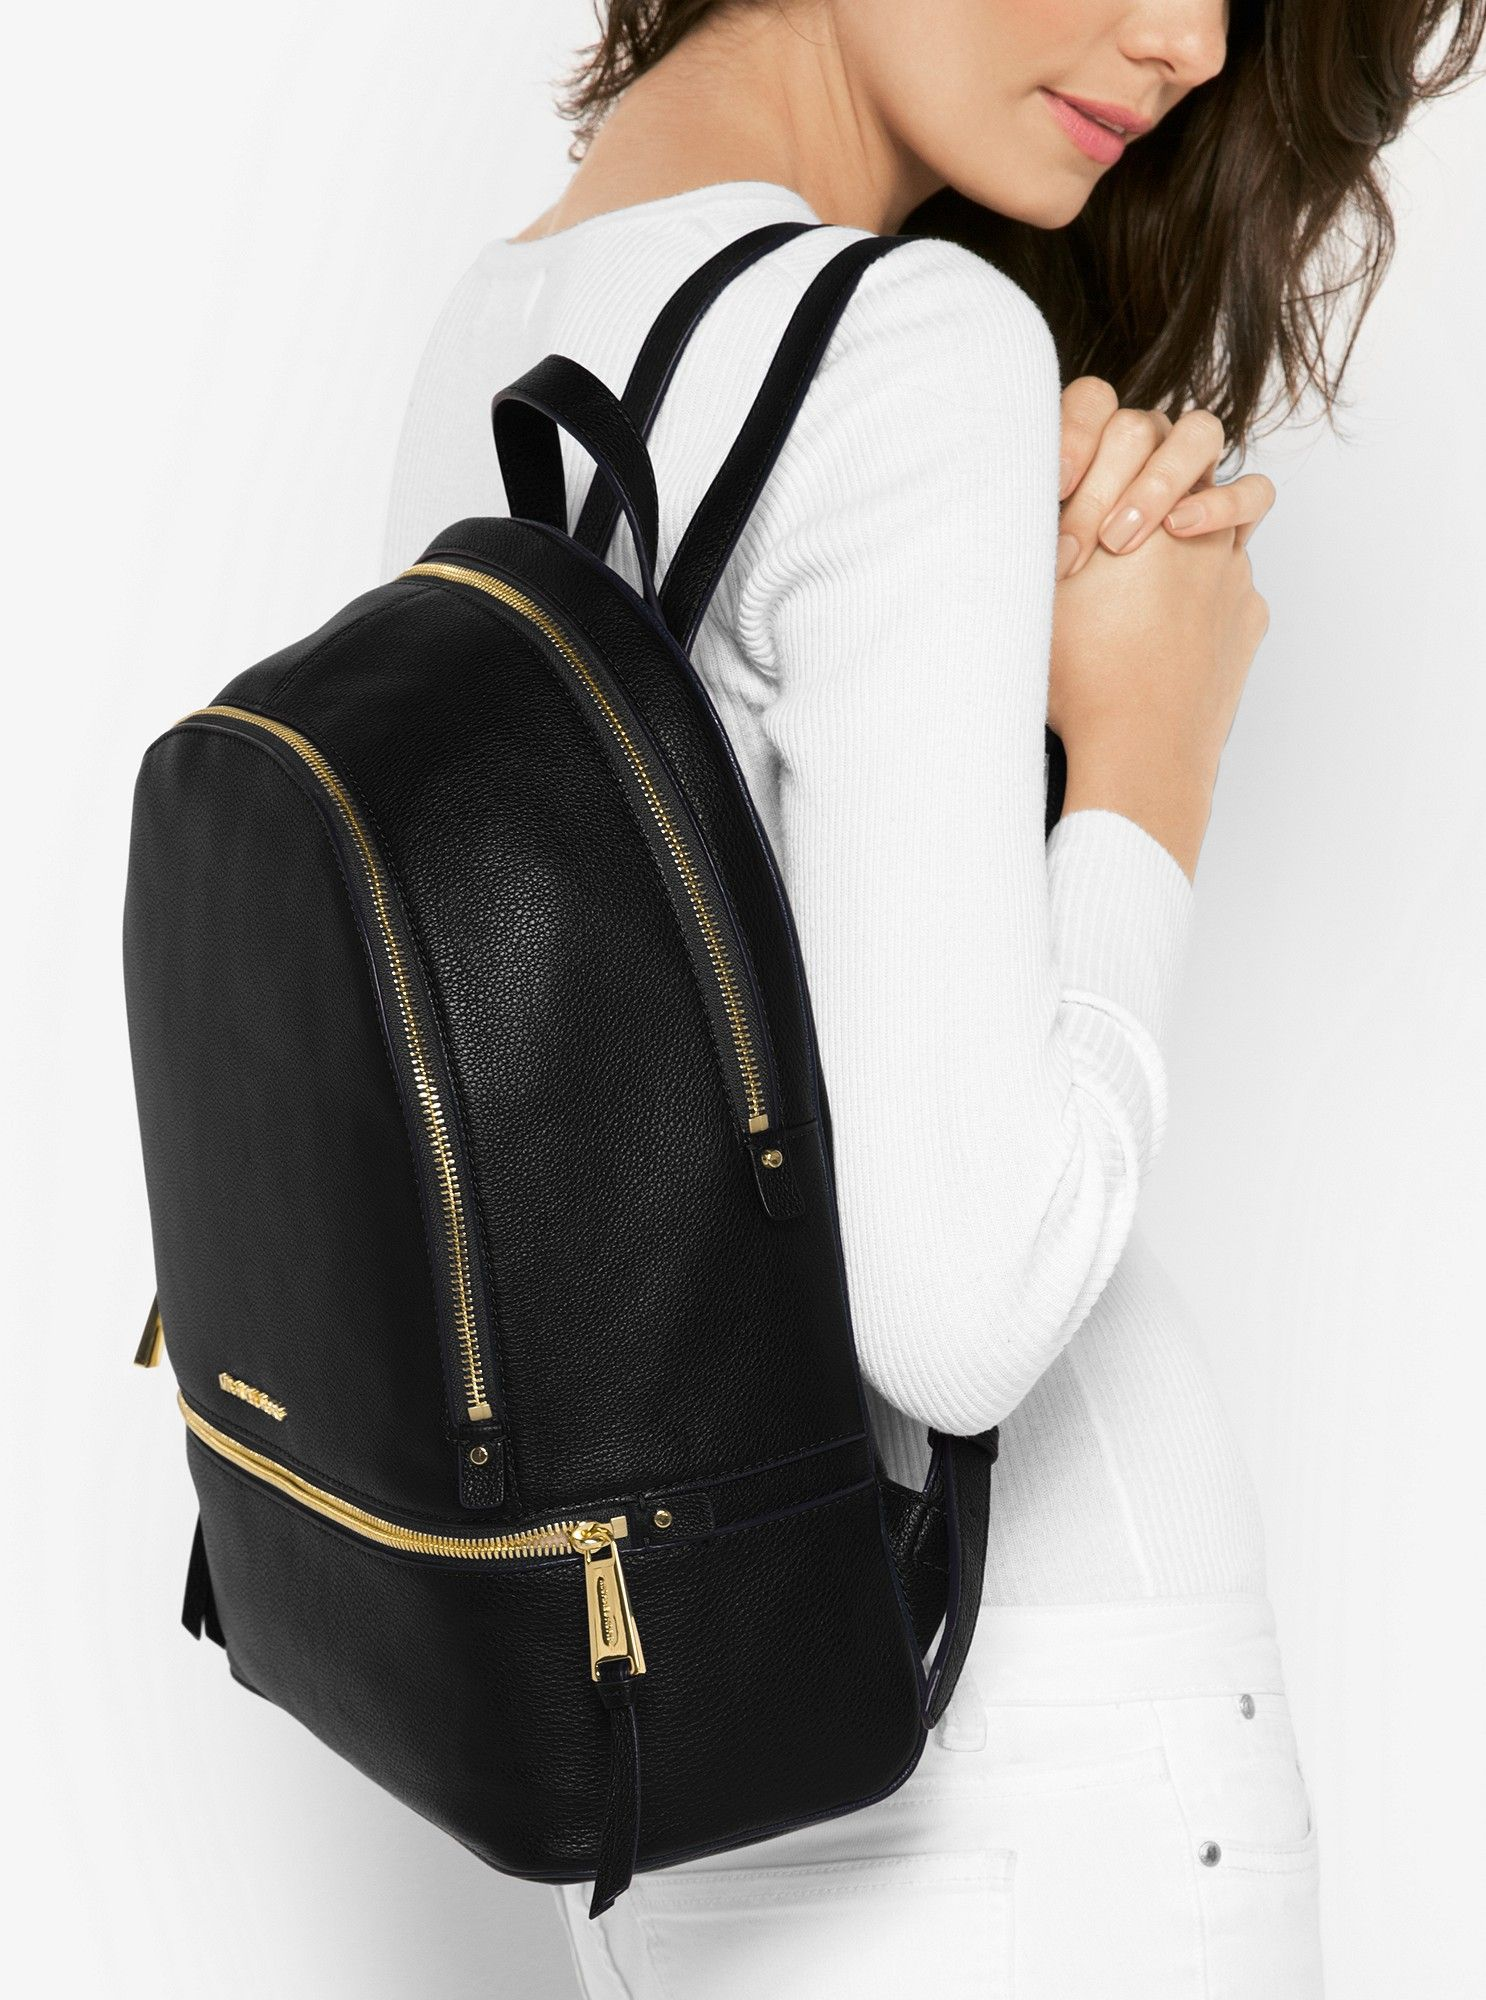 b76b03e8a28b19 Michael Kors Rhea Large Leather Backpack - Black in 2019 | Products ...